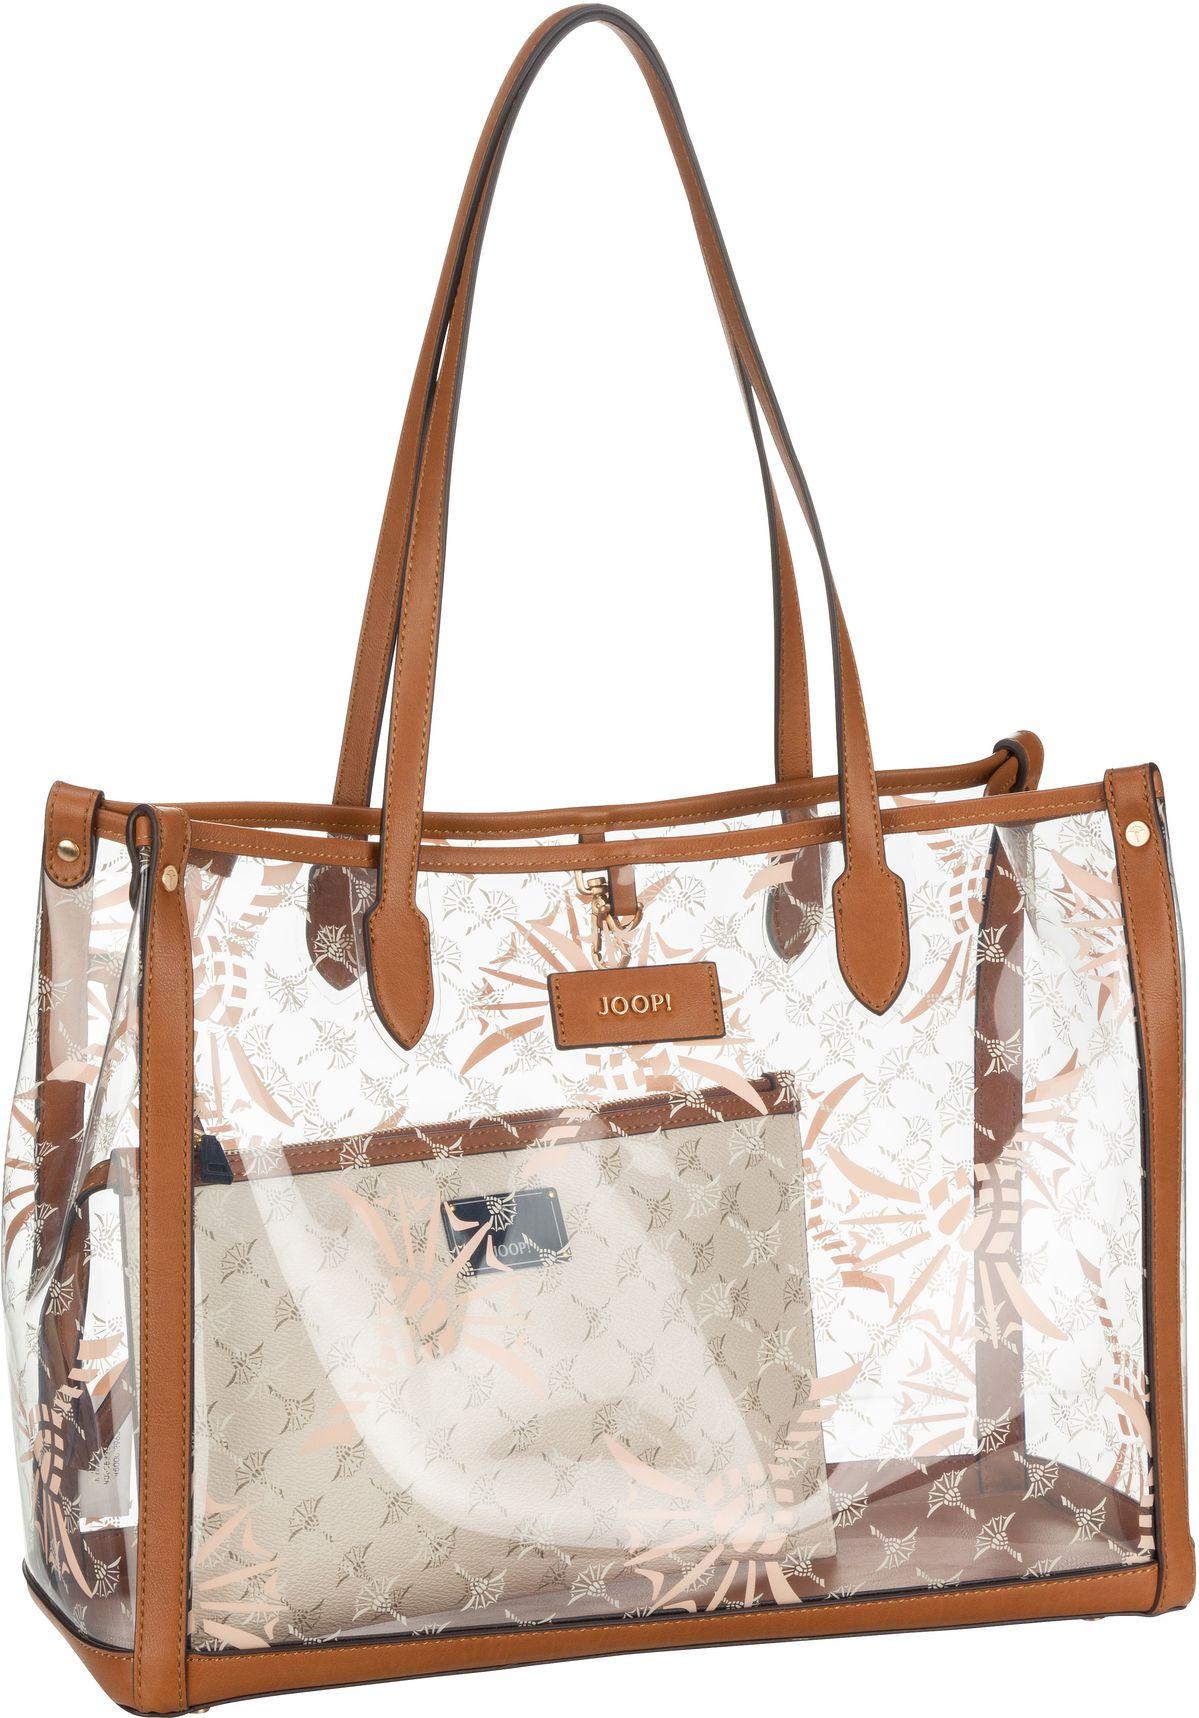 Handtasche Cristallino Lelia Shopper LHO Cognac